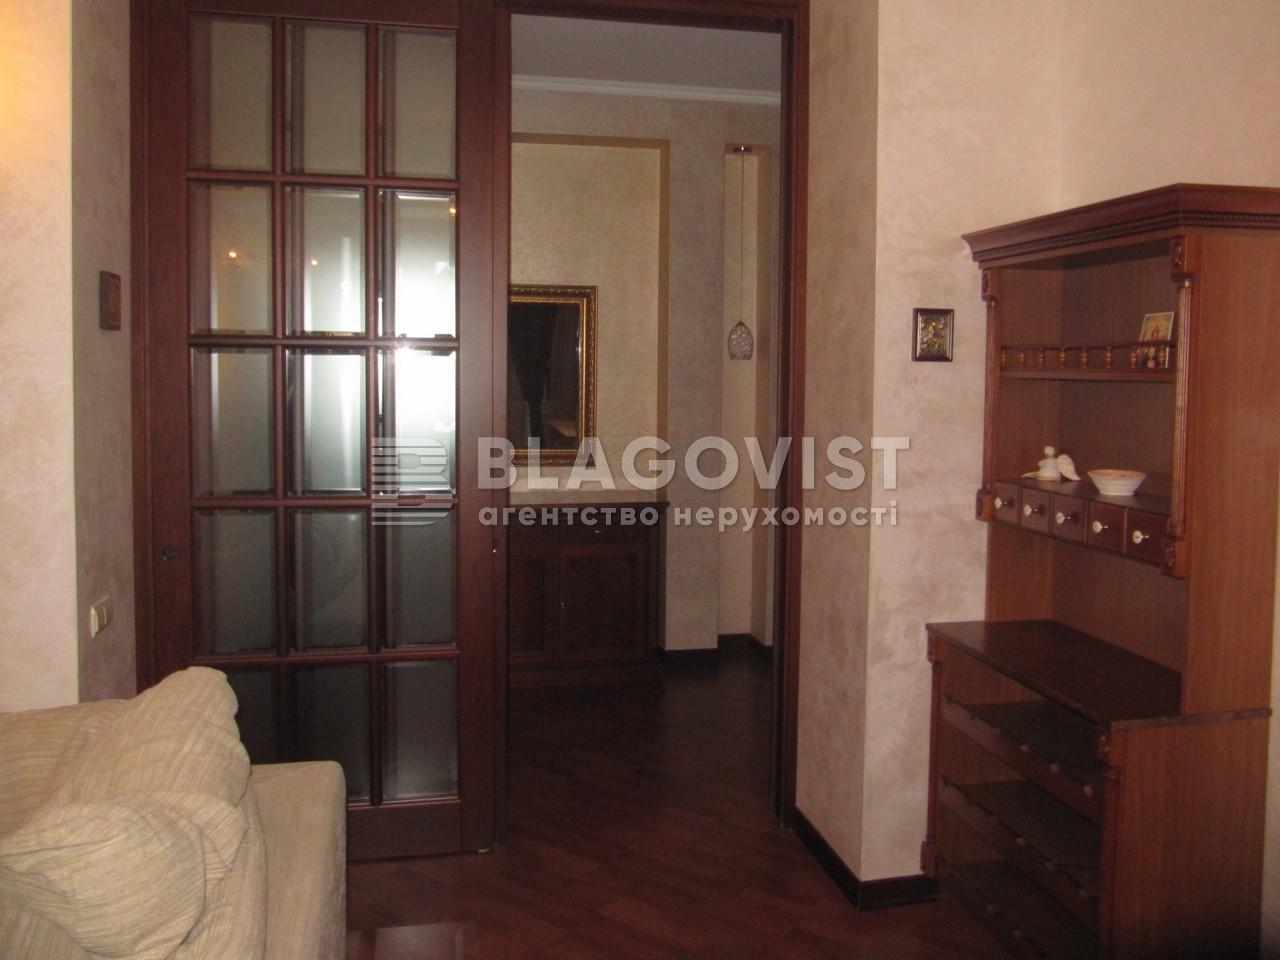 Квартира R-1852, Кловский спуск, 5, Киев - Фото 8